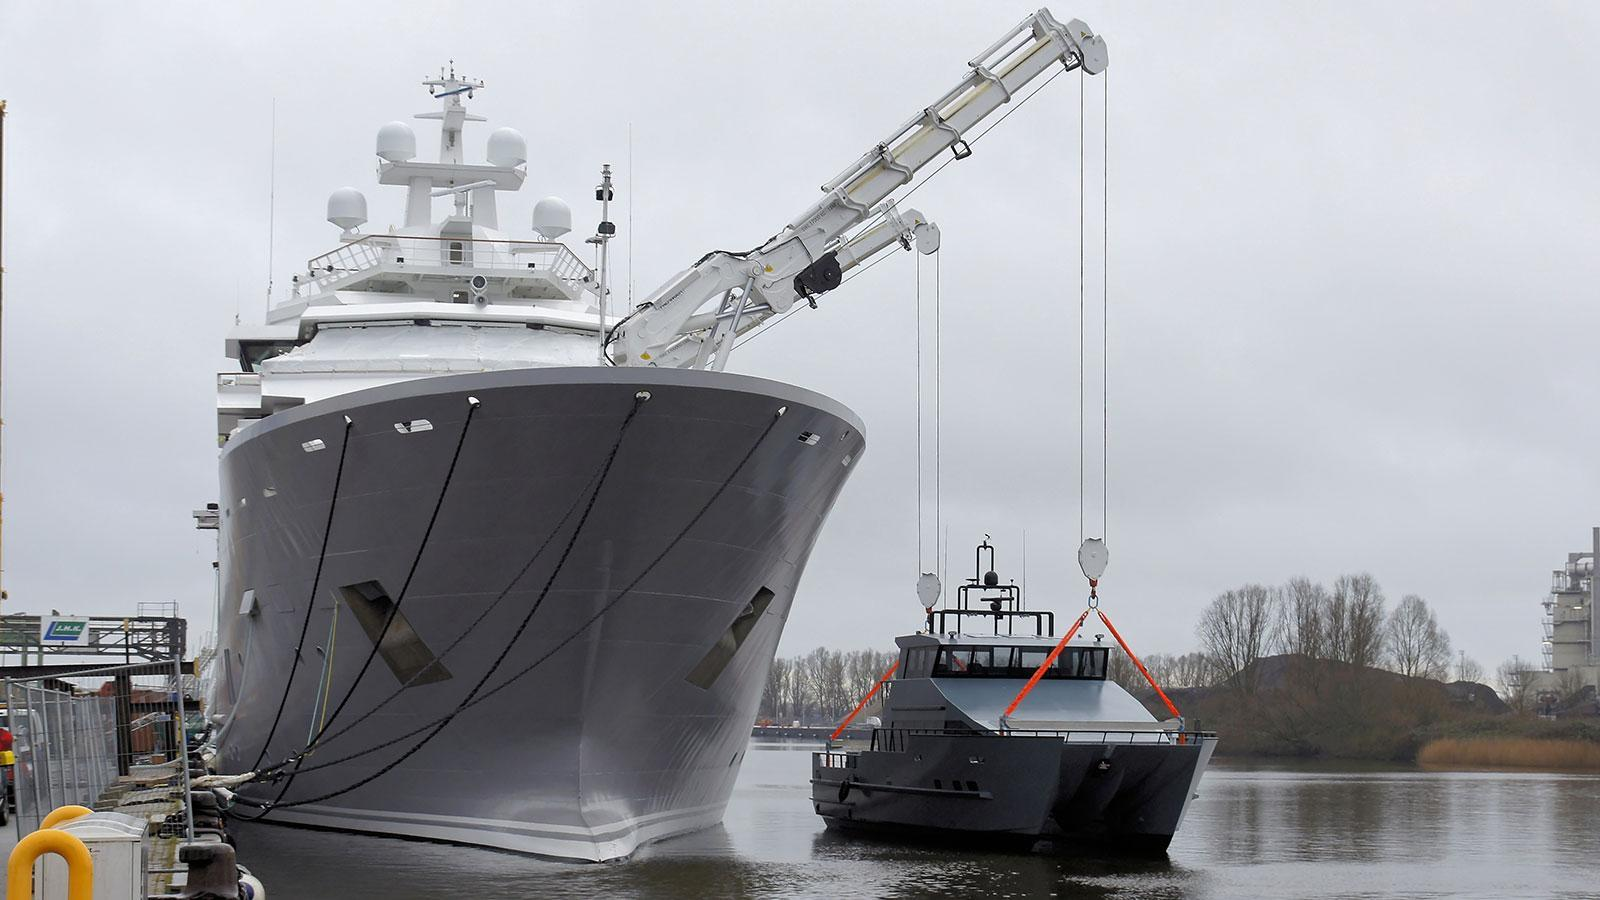 andromeda-ulysses-explorer-yacht-kleven-2015-107m-wharf